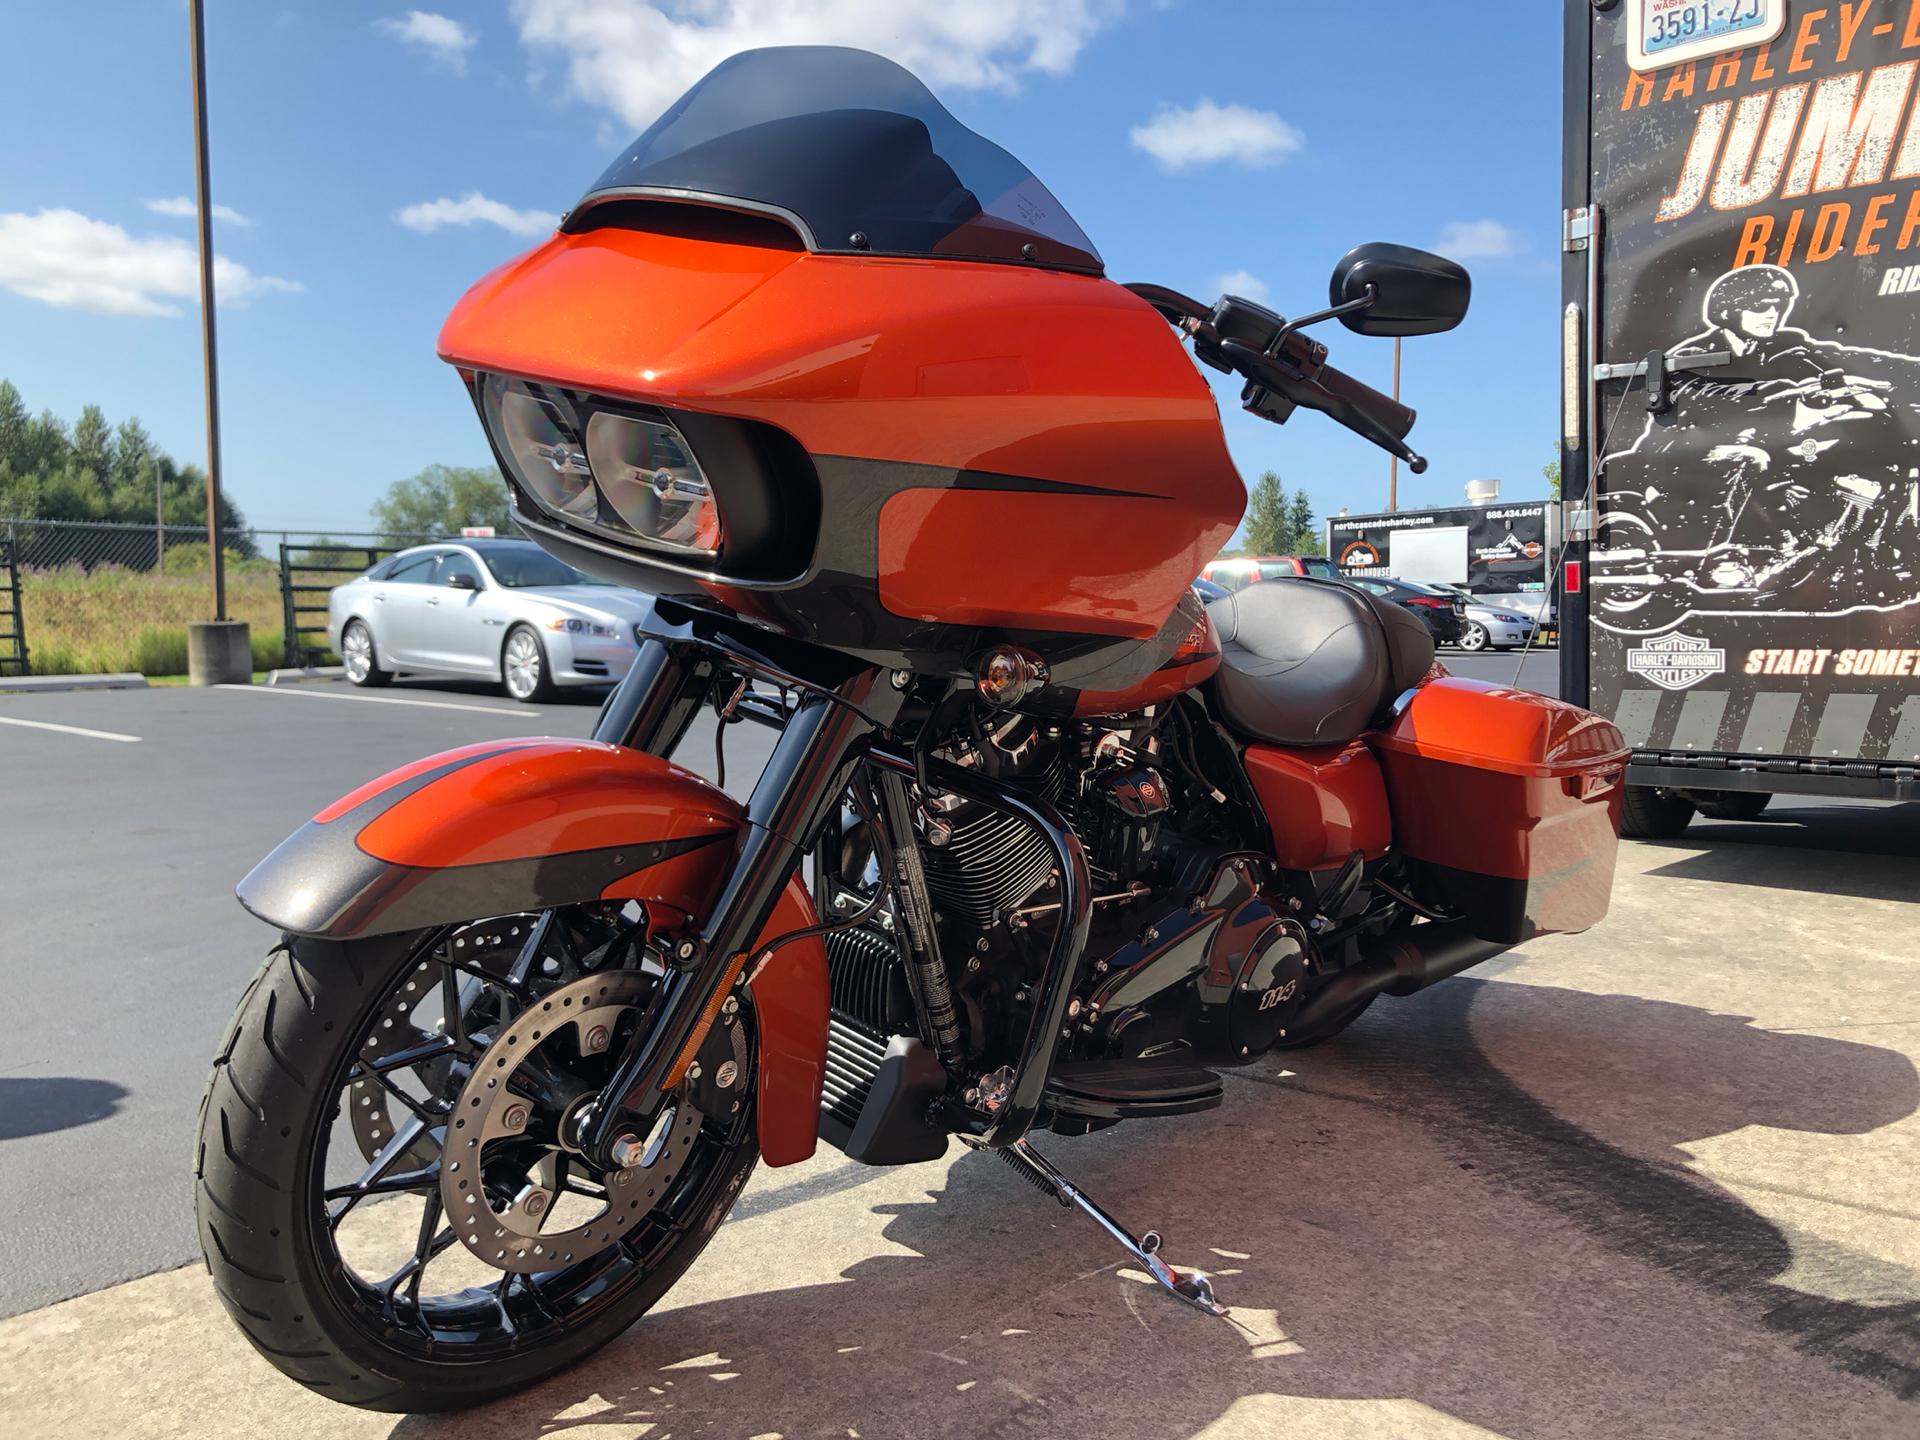 2020 Harley-Davidson Road Glide® Special in Burlington, Washington